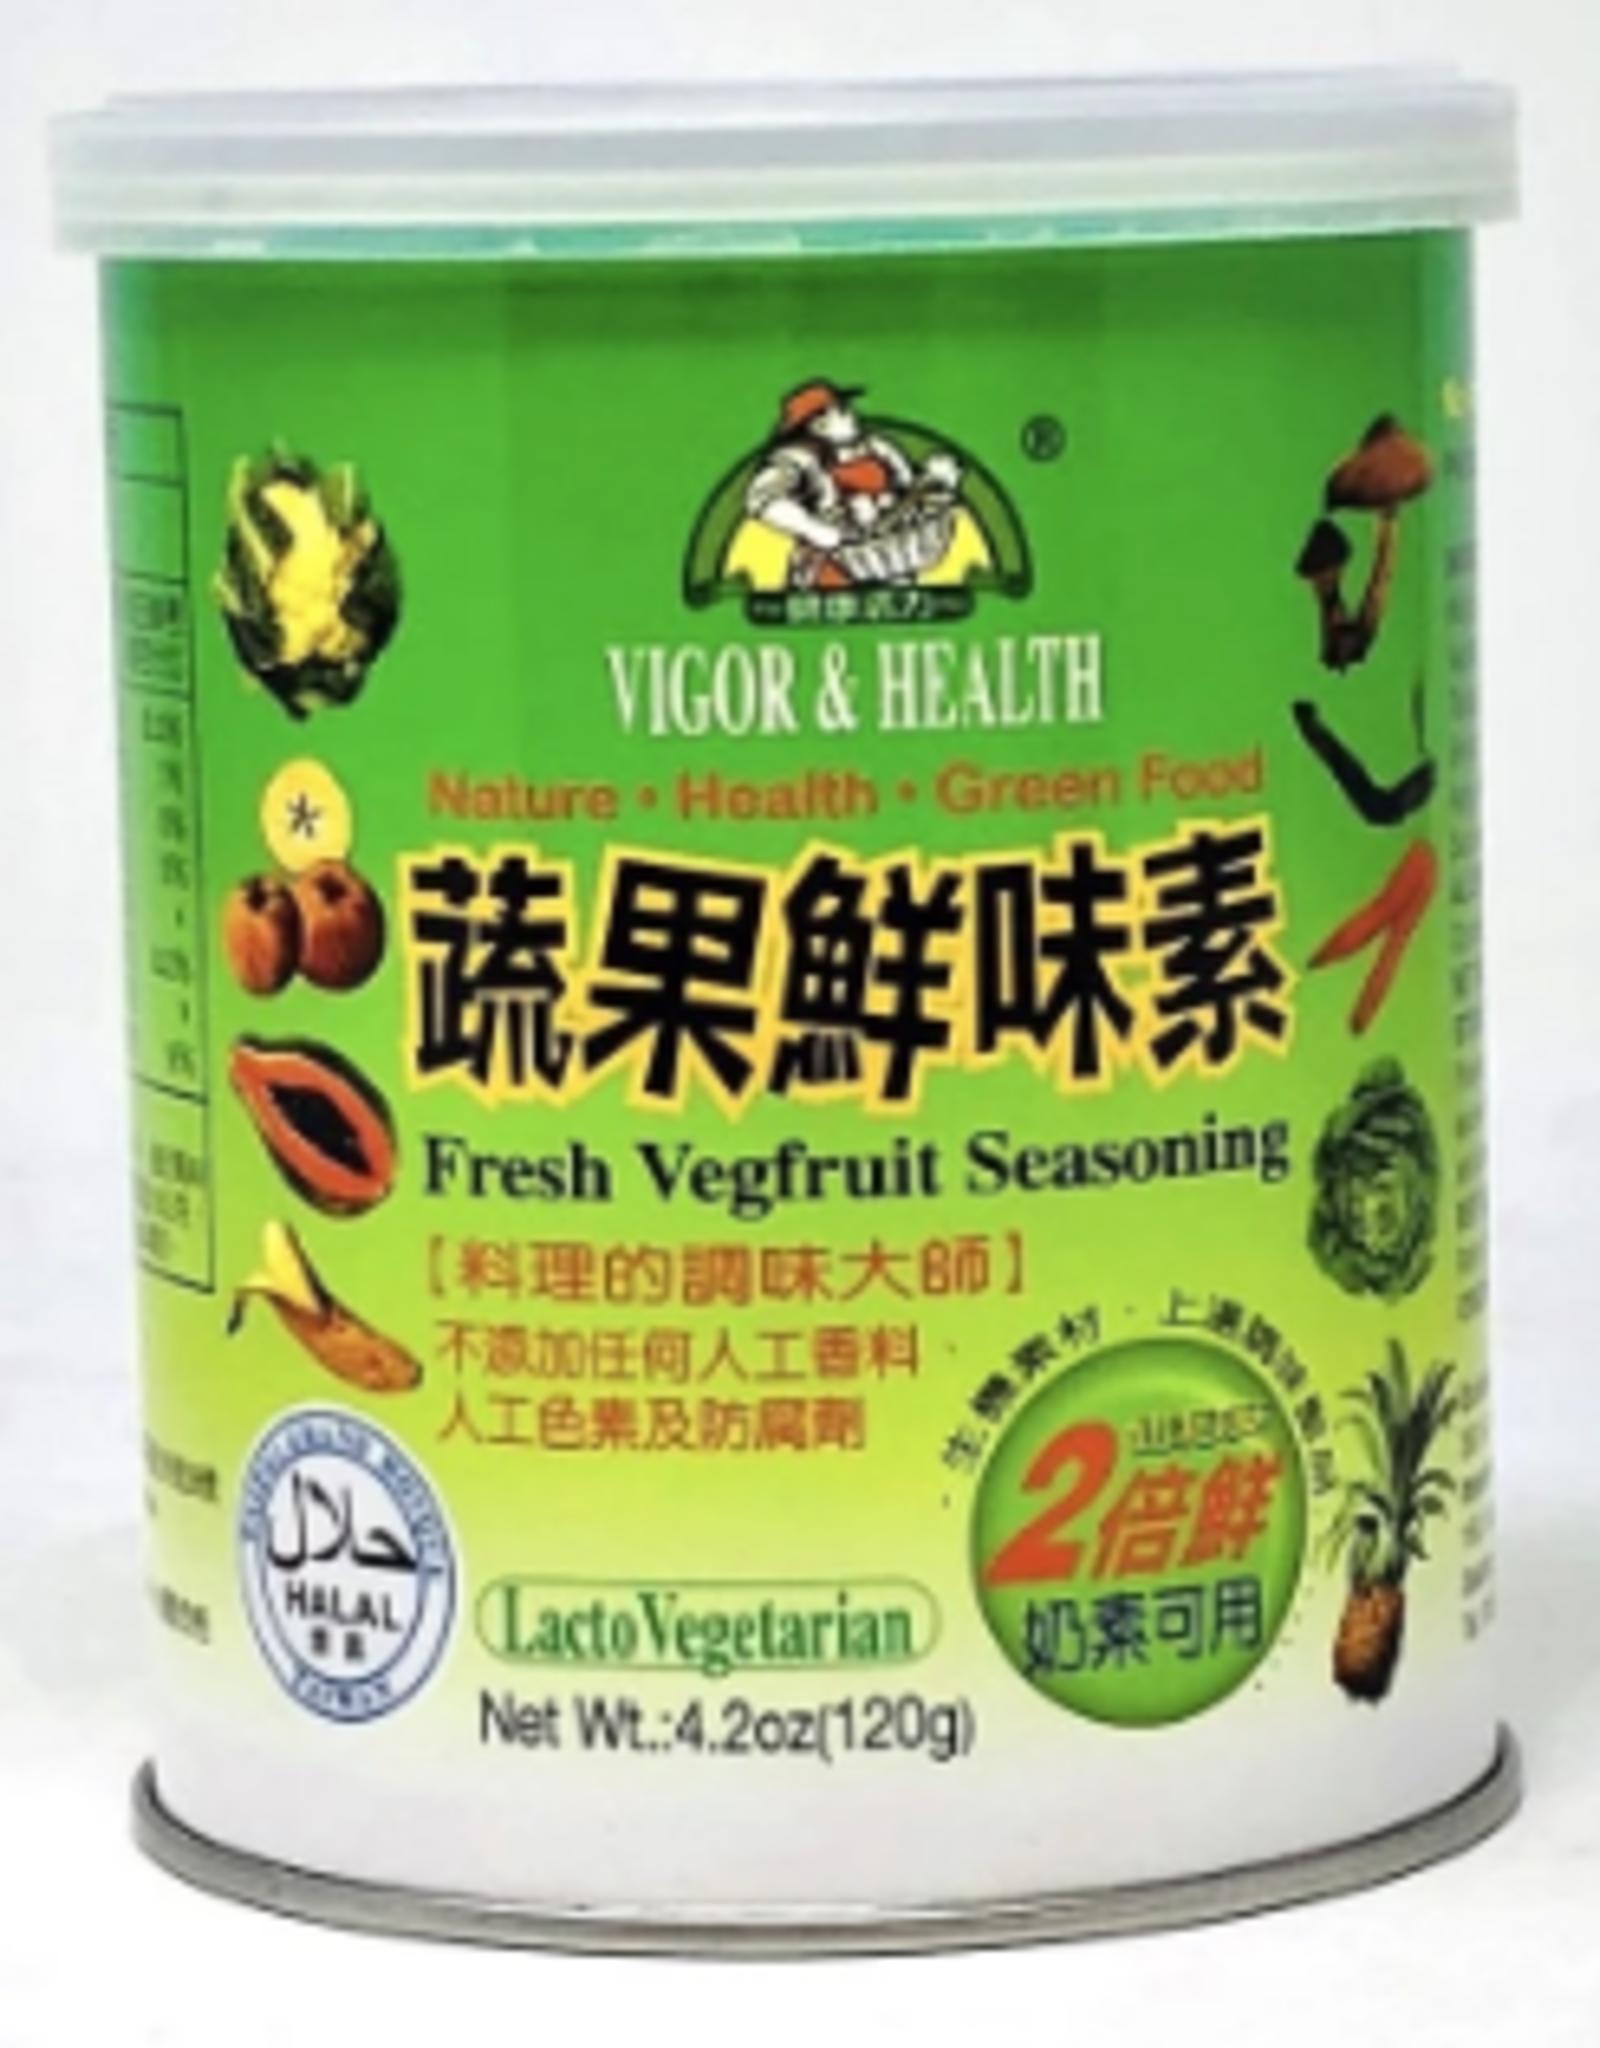 (UK) Vege Fresh Vegefruit Seasoning*(有機廚坊) 蔬果鮮味素